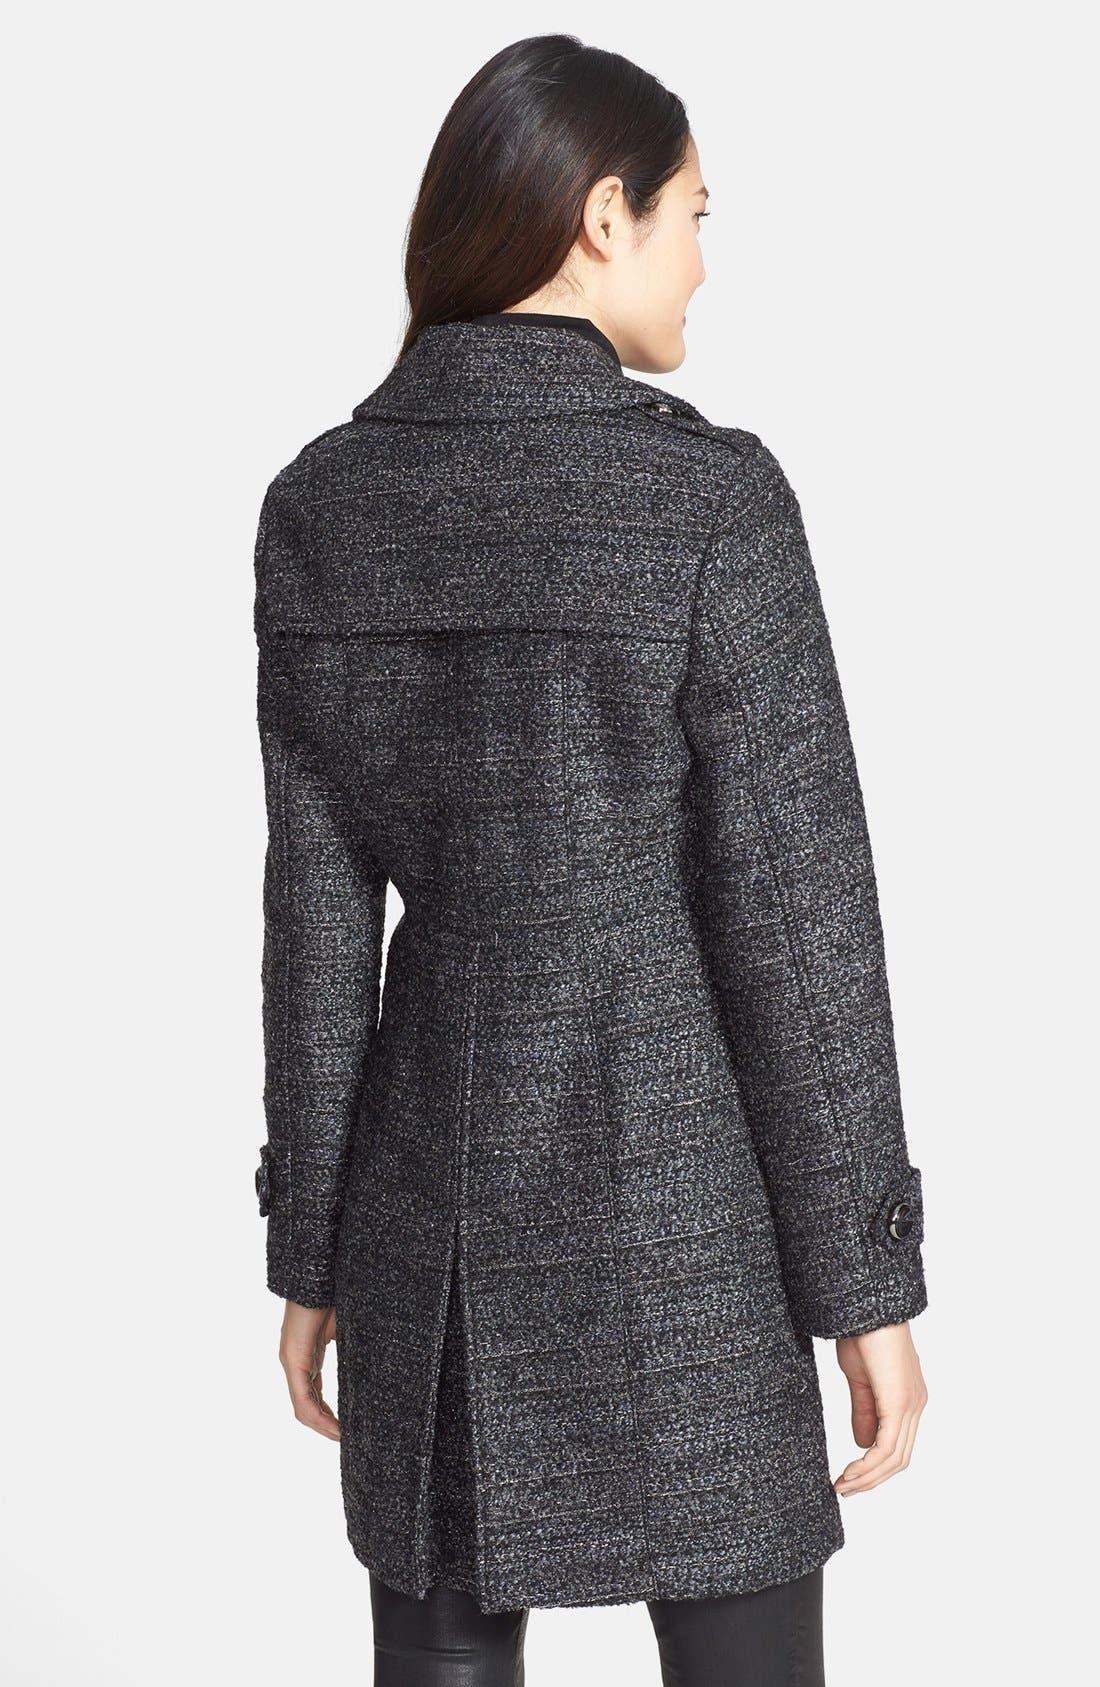 Alternate Image 2  - Kenneth Cole New York Metallic Tweed Walking Coat (Online Only)